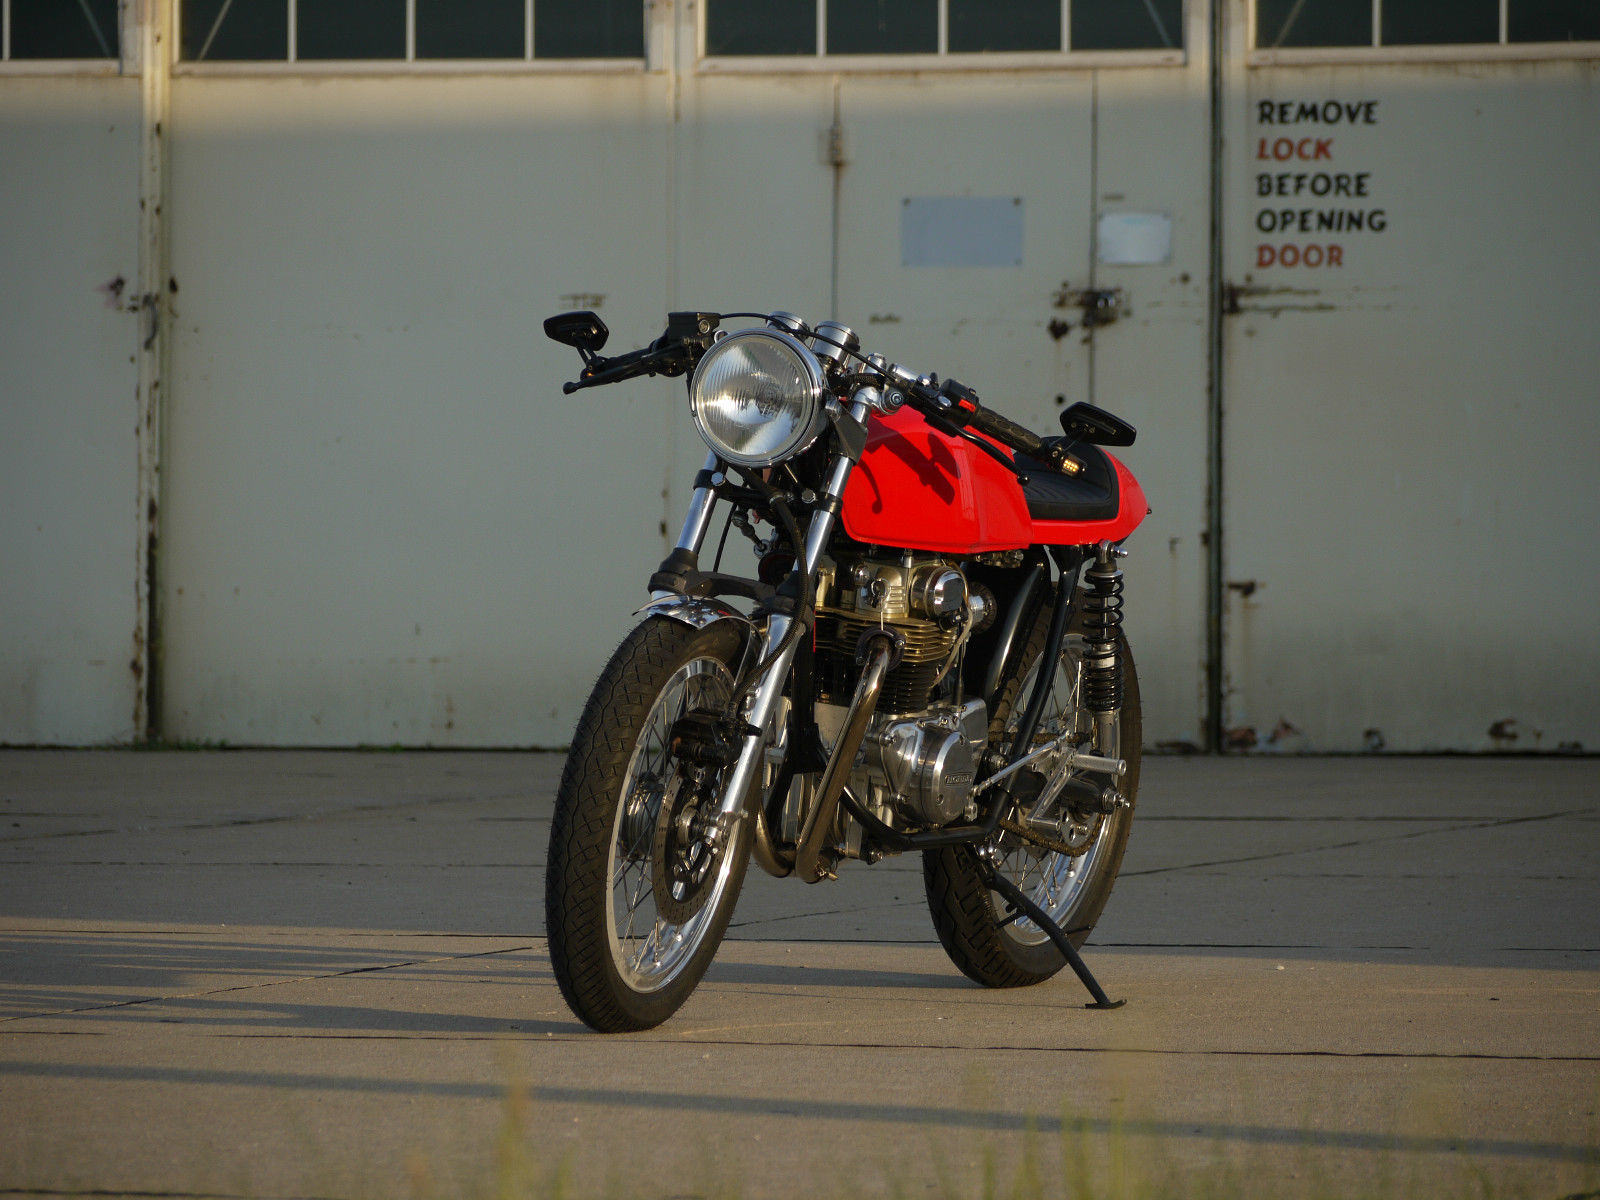 Honda_CB350_Cafe_Racer_1. Honda_CB350_Cafe_Racer_Collage. Honda_CB350_Cafe_Racer_18. Honda_CB350_Cafe_Racer_17. Honda_CB350_Cafe_Racer_15